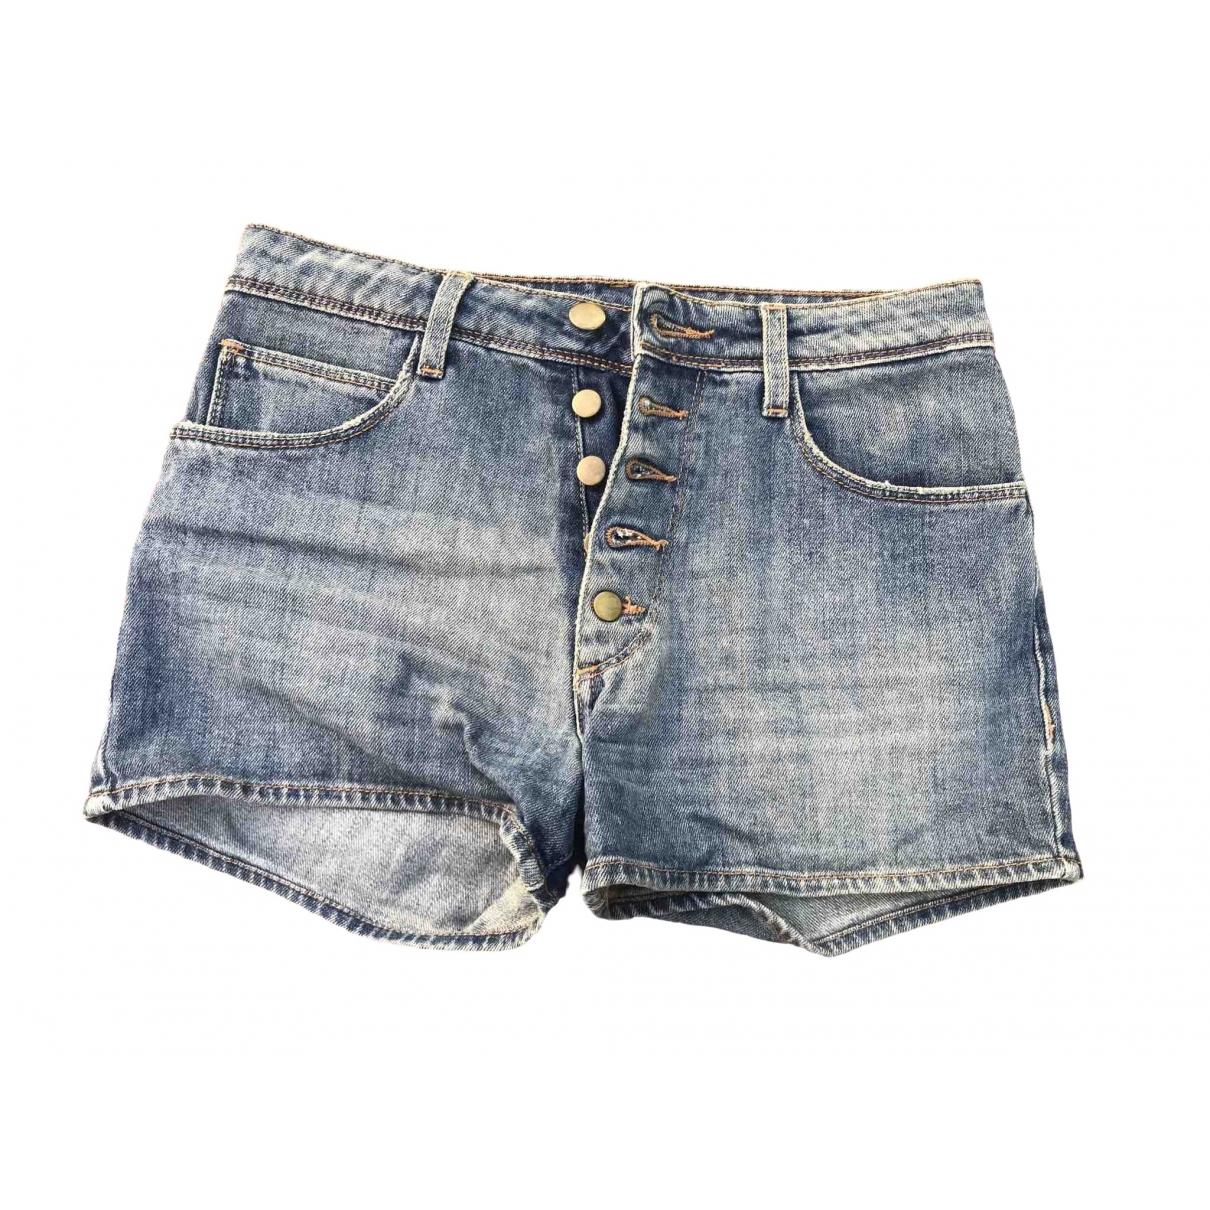 Acquaverde \N Shorts in  Blau Baumwolle